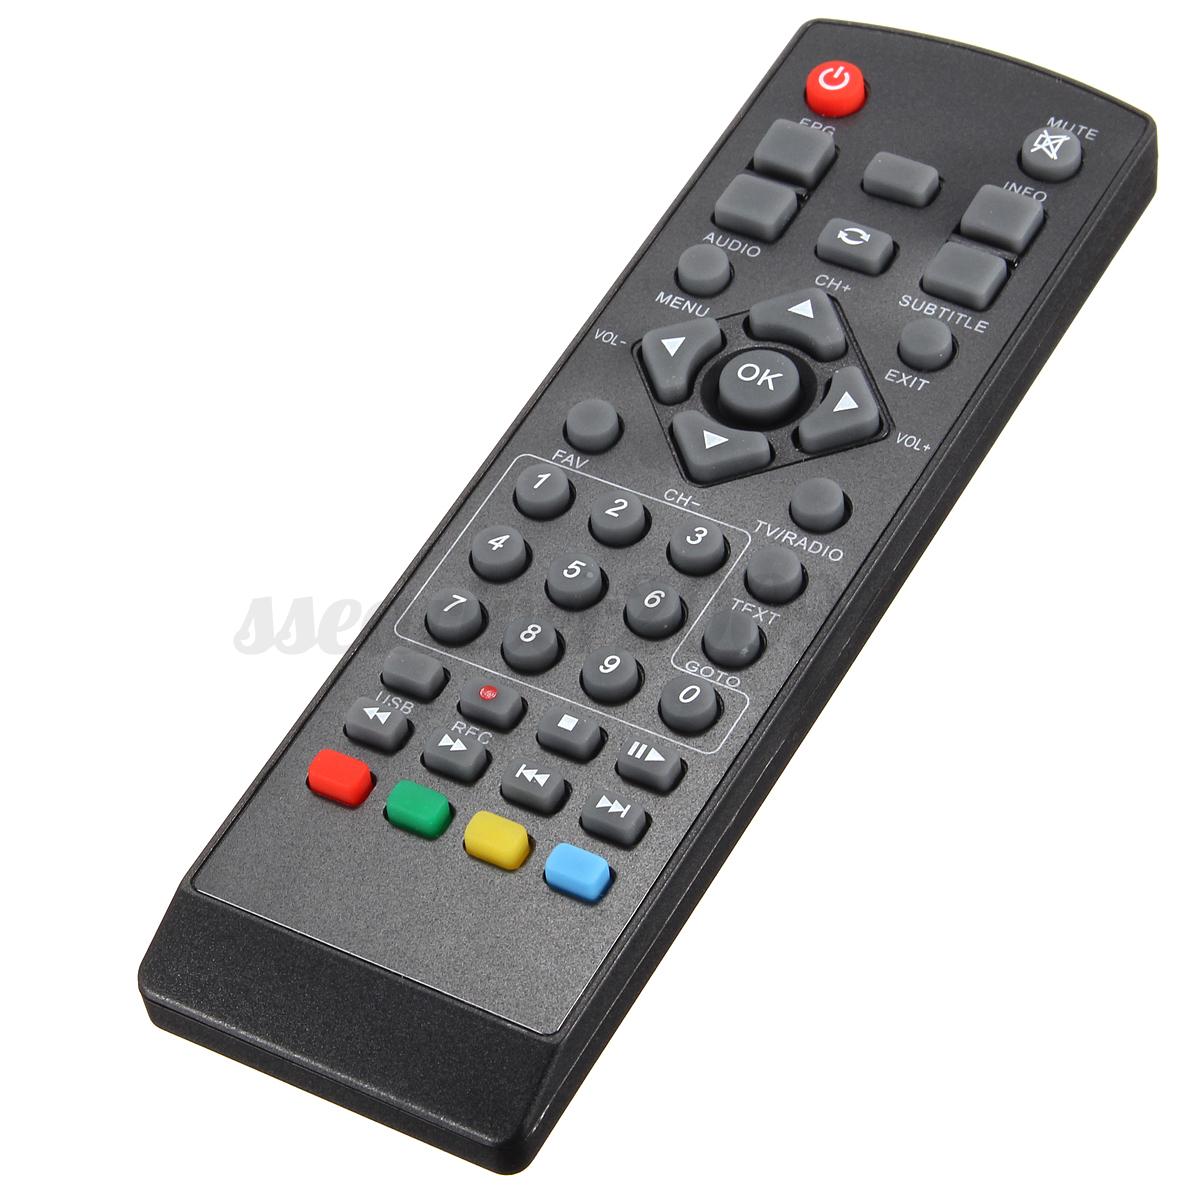 eu full hd 1080p dvb t2 s2 video broadcasting satellite. Black Bedroom Furniture Sets. Home Design Ideas